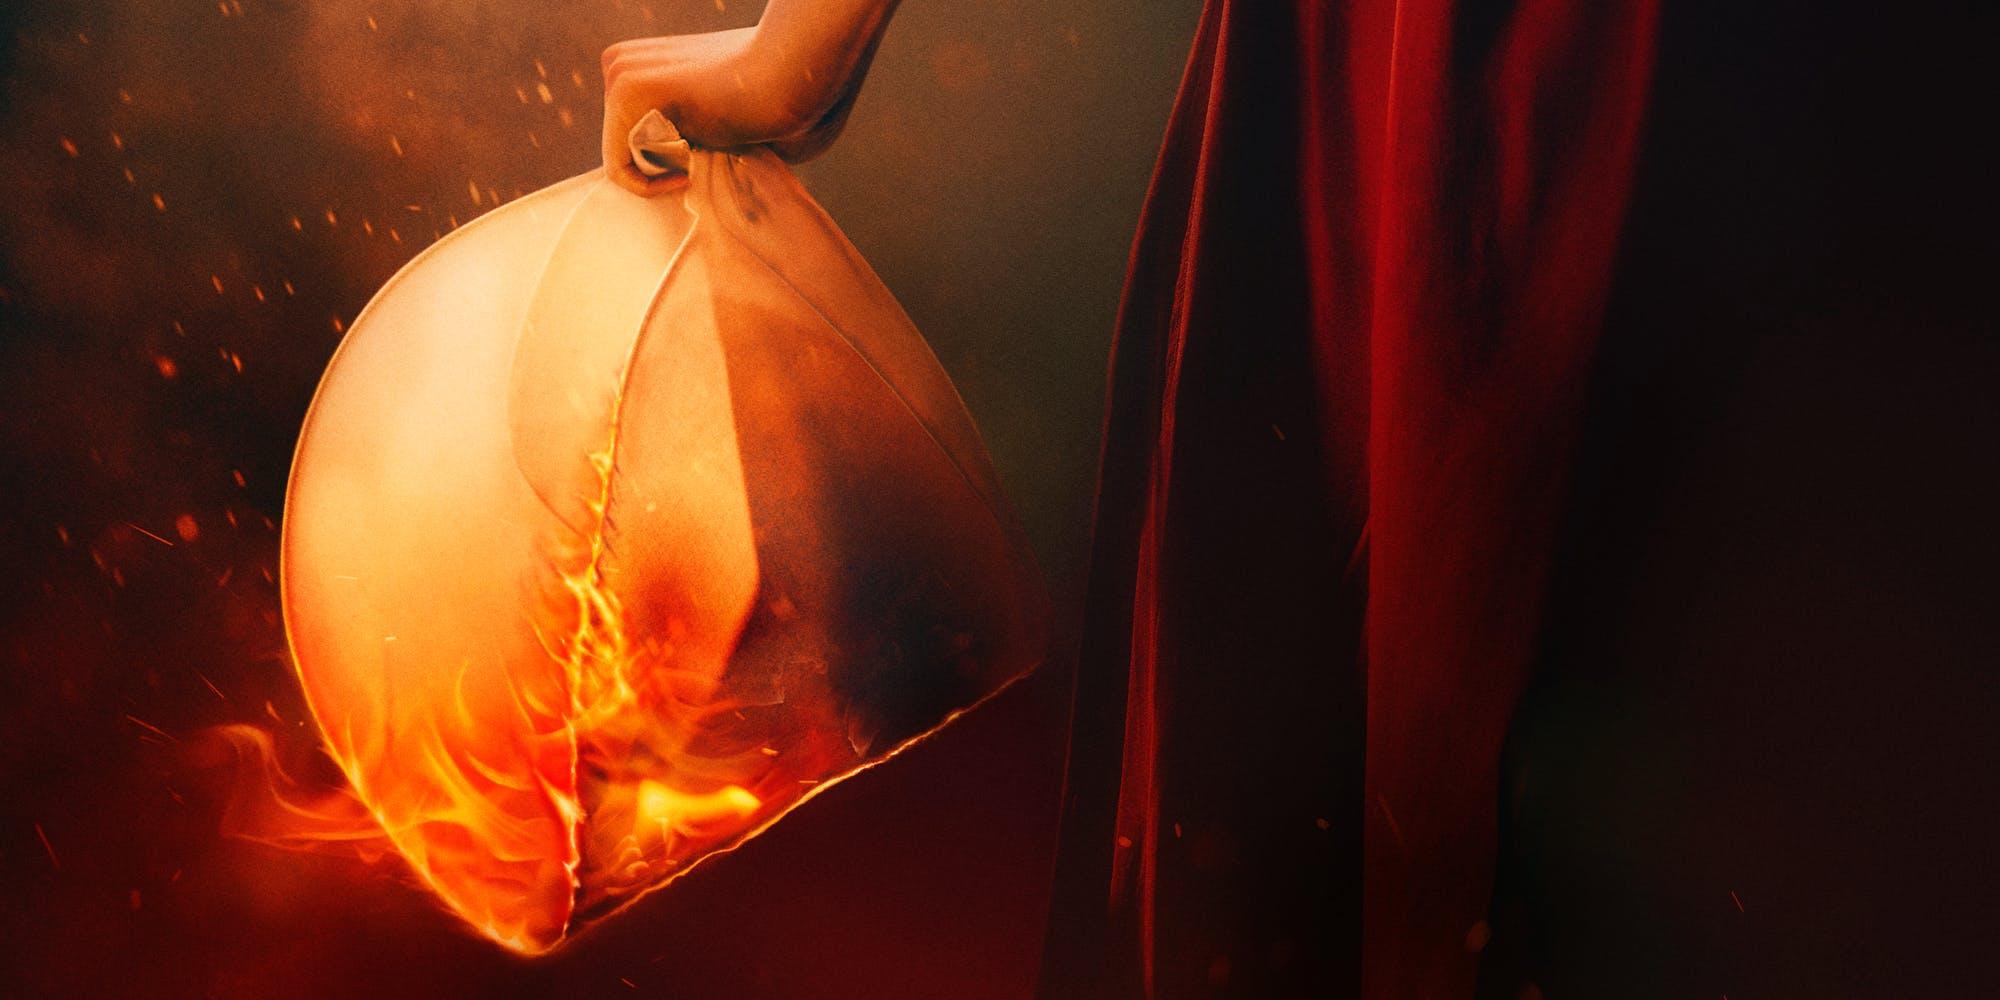 The Handmaids Tale Season 2 Poster